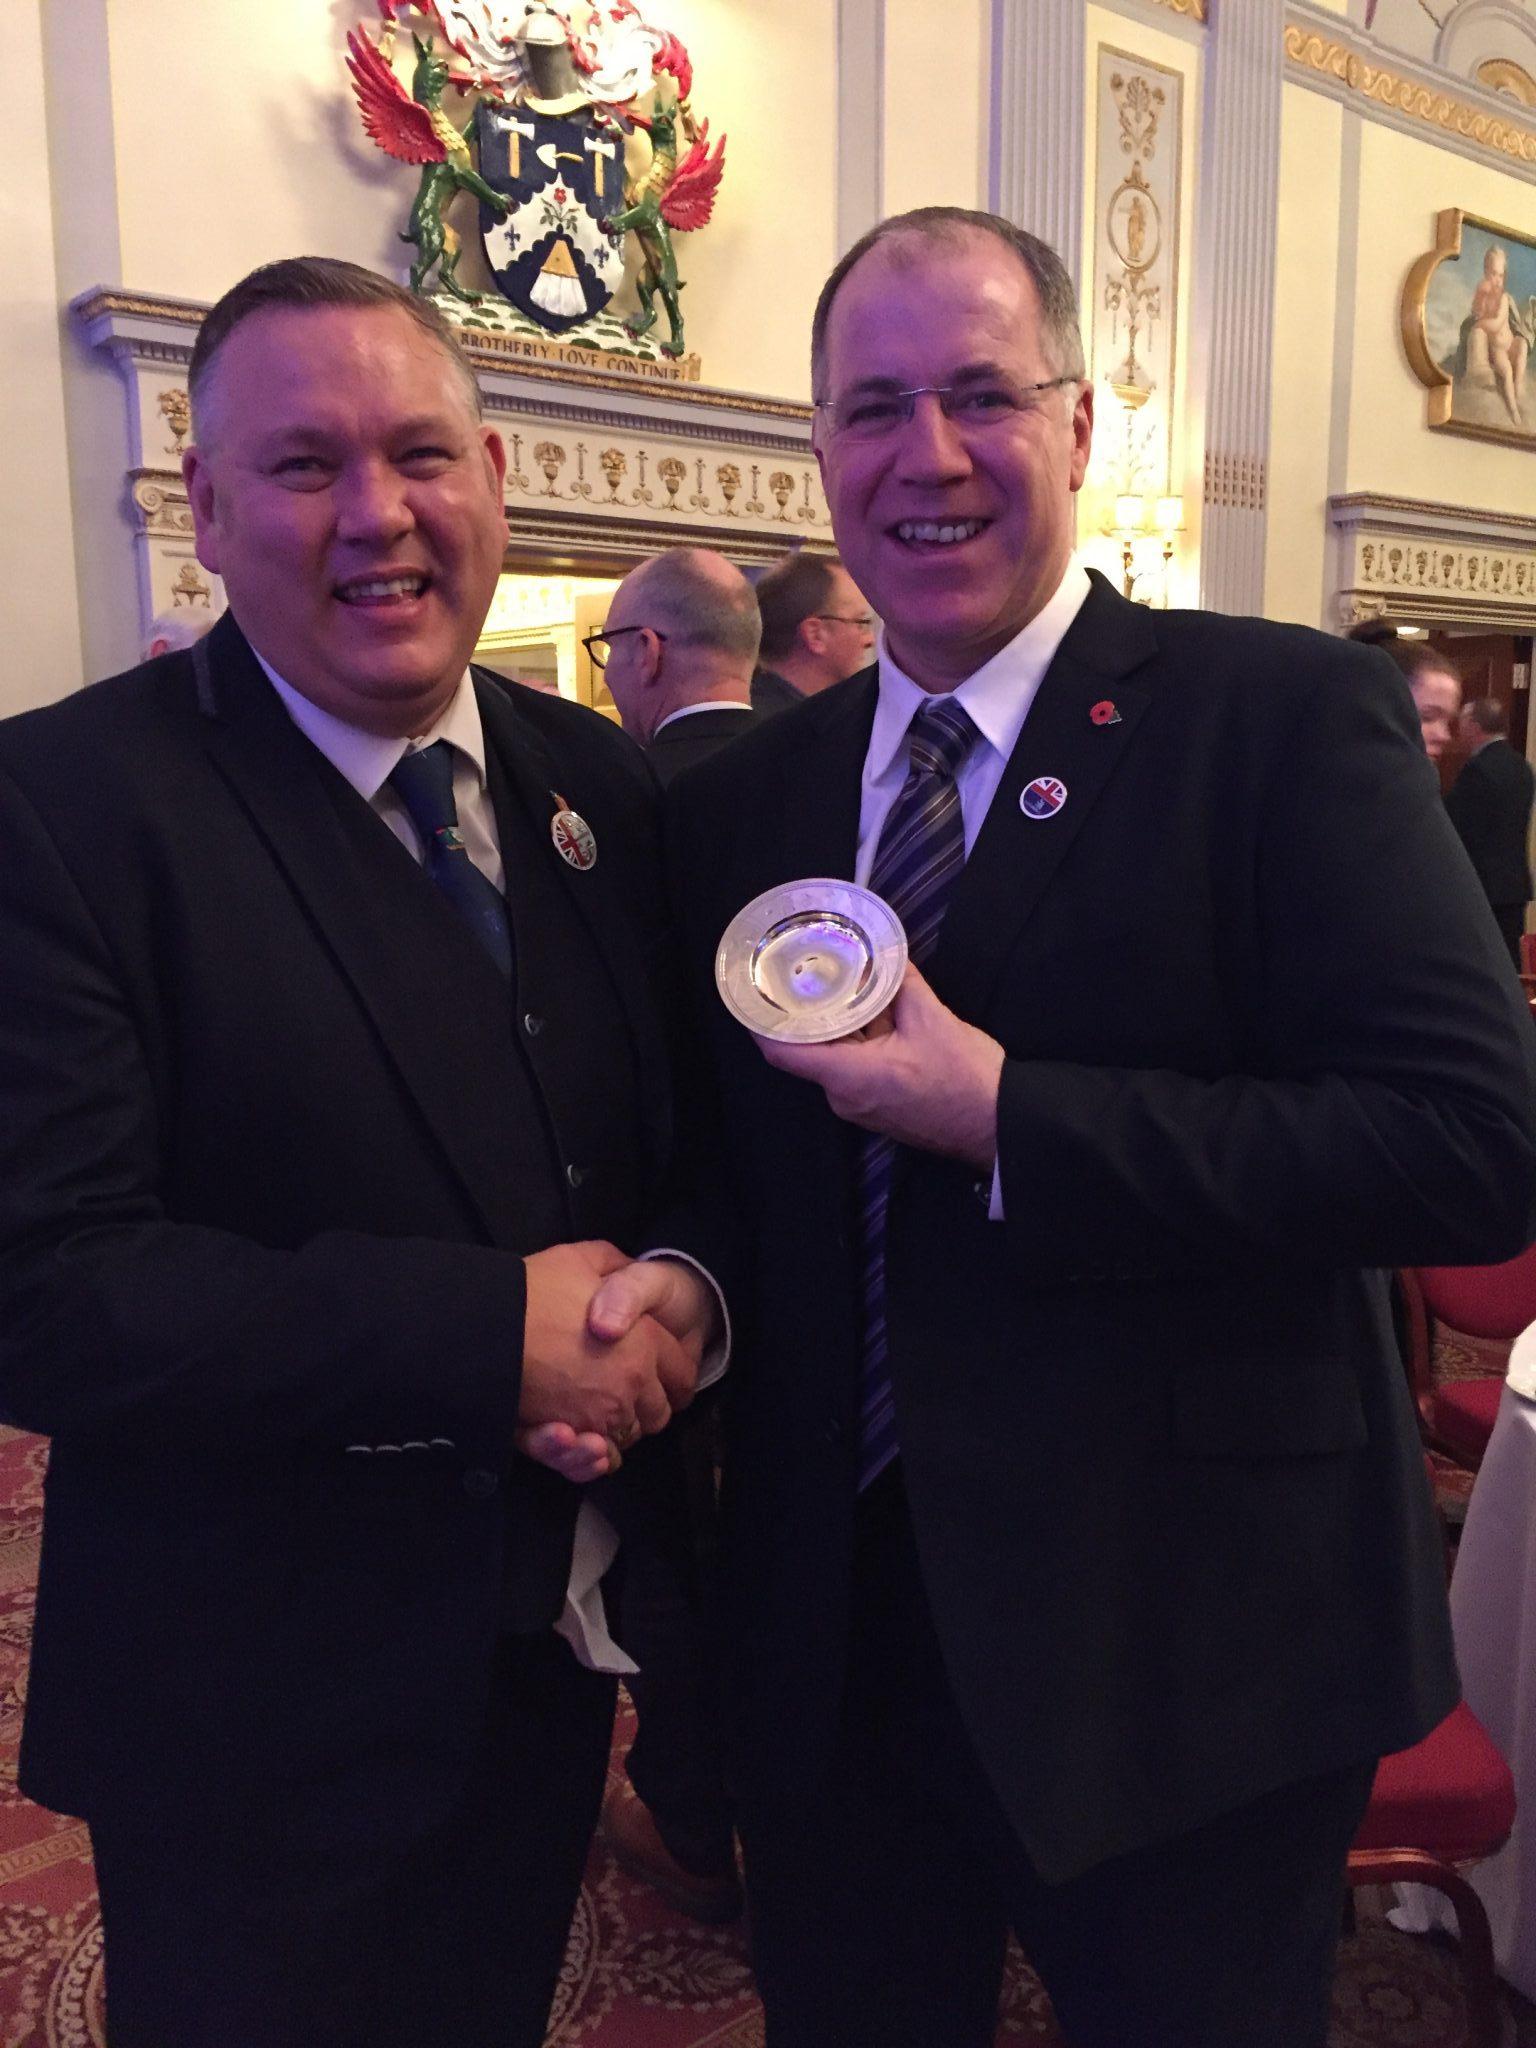 David Kehoe nominated David Hall for Lifetime Contribution to Training Award 1